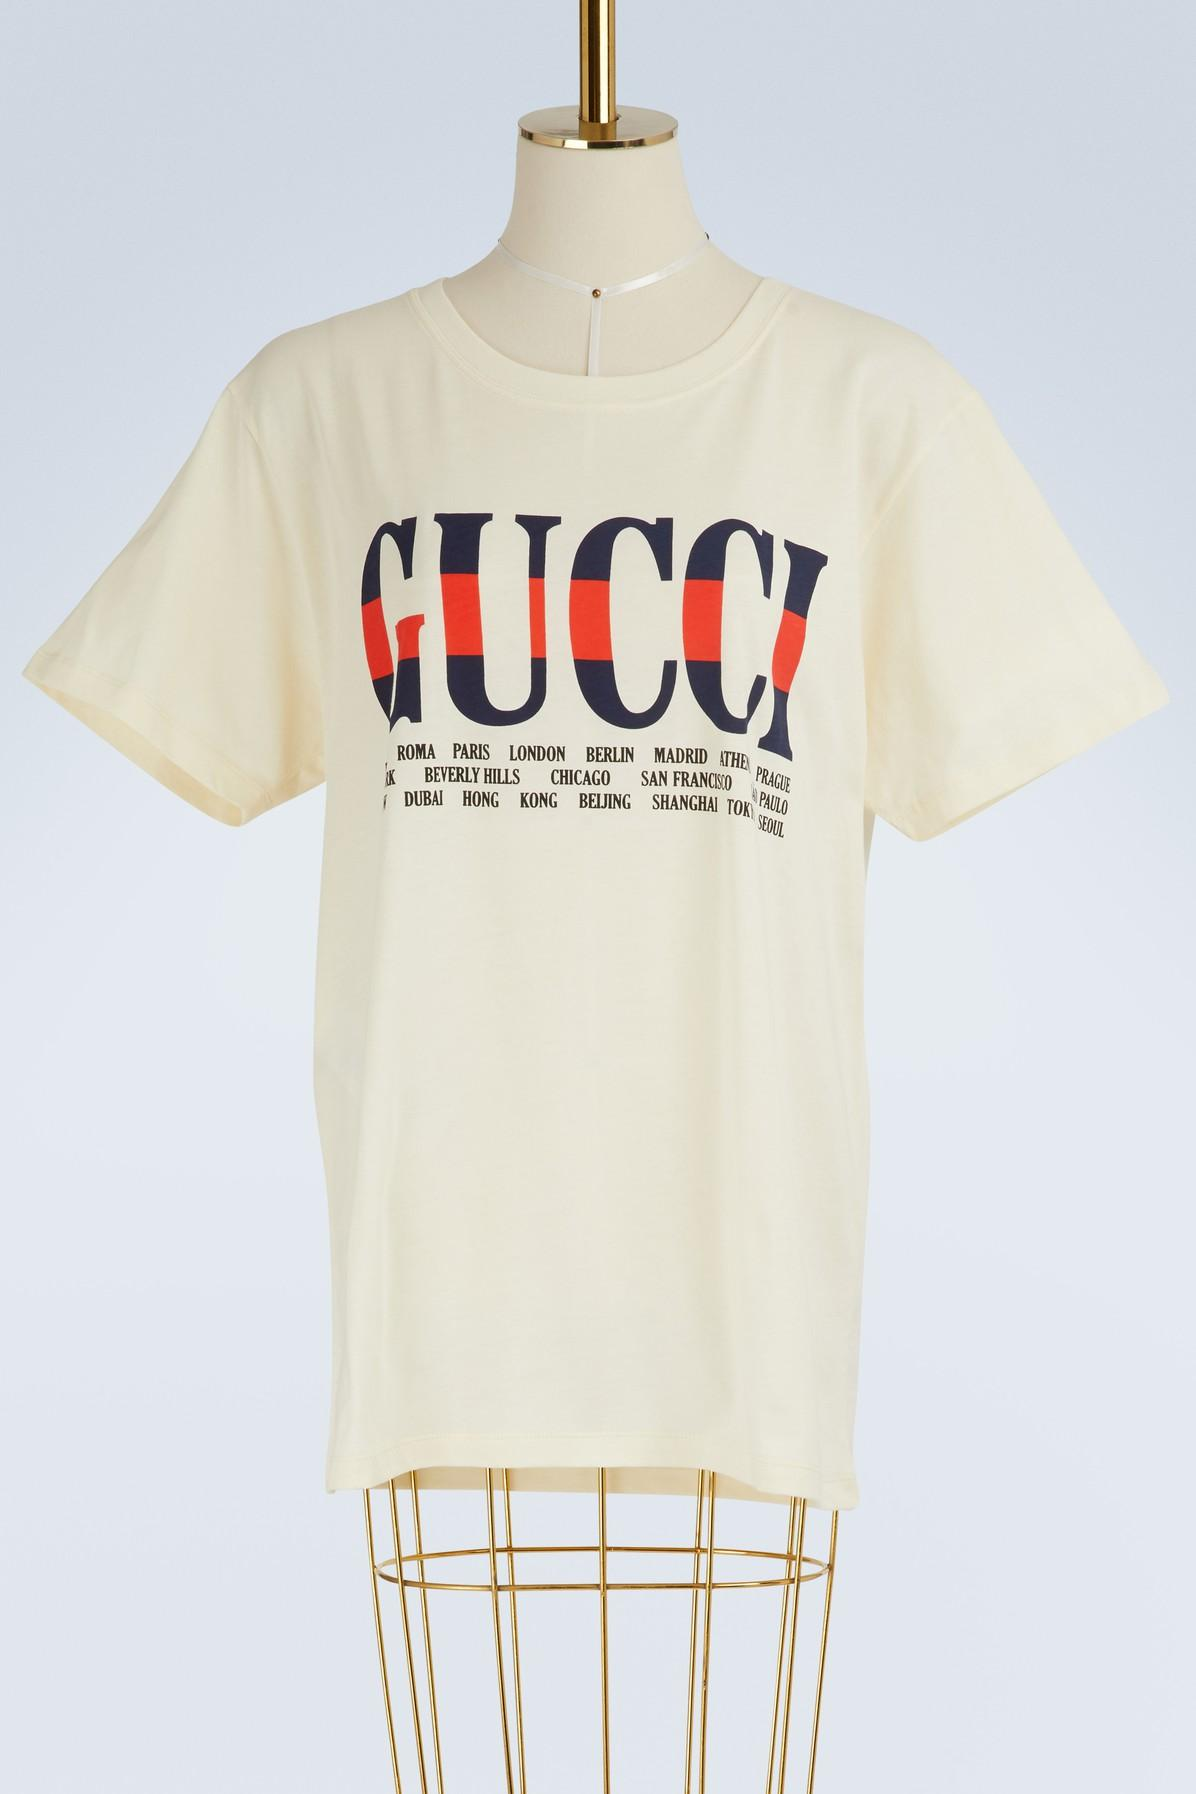 836303b32d5 Gucci - White Negozio Printed T-shirt - Lyst. View fullscreen